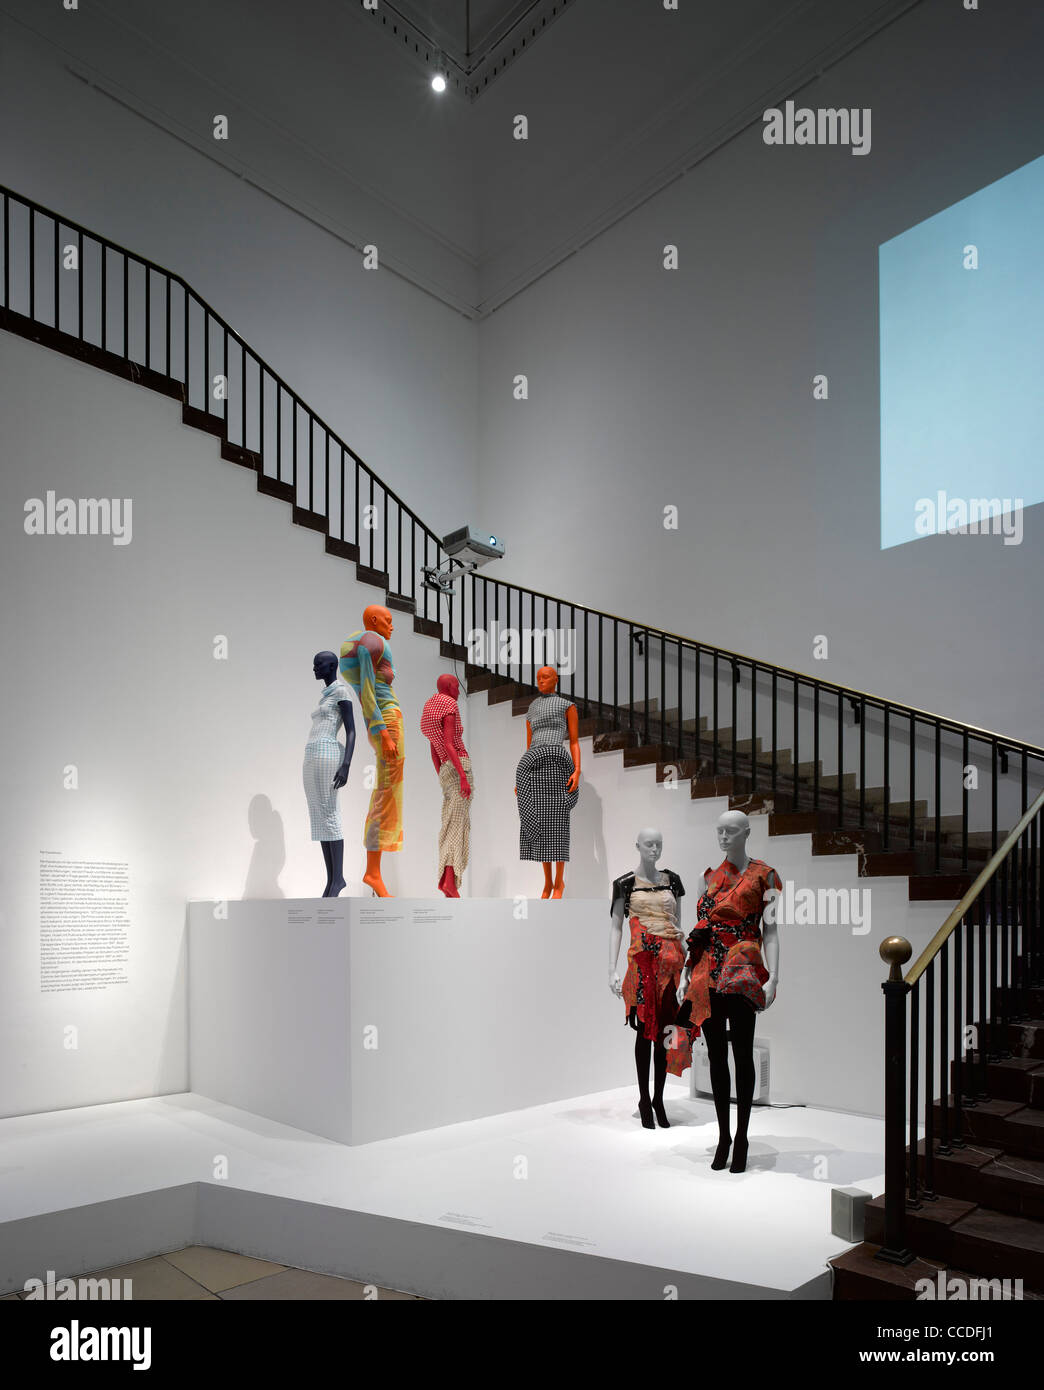 Kunst Stockfotos & Kunst Bilder Alamy